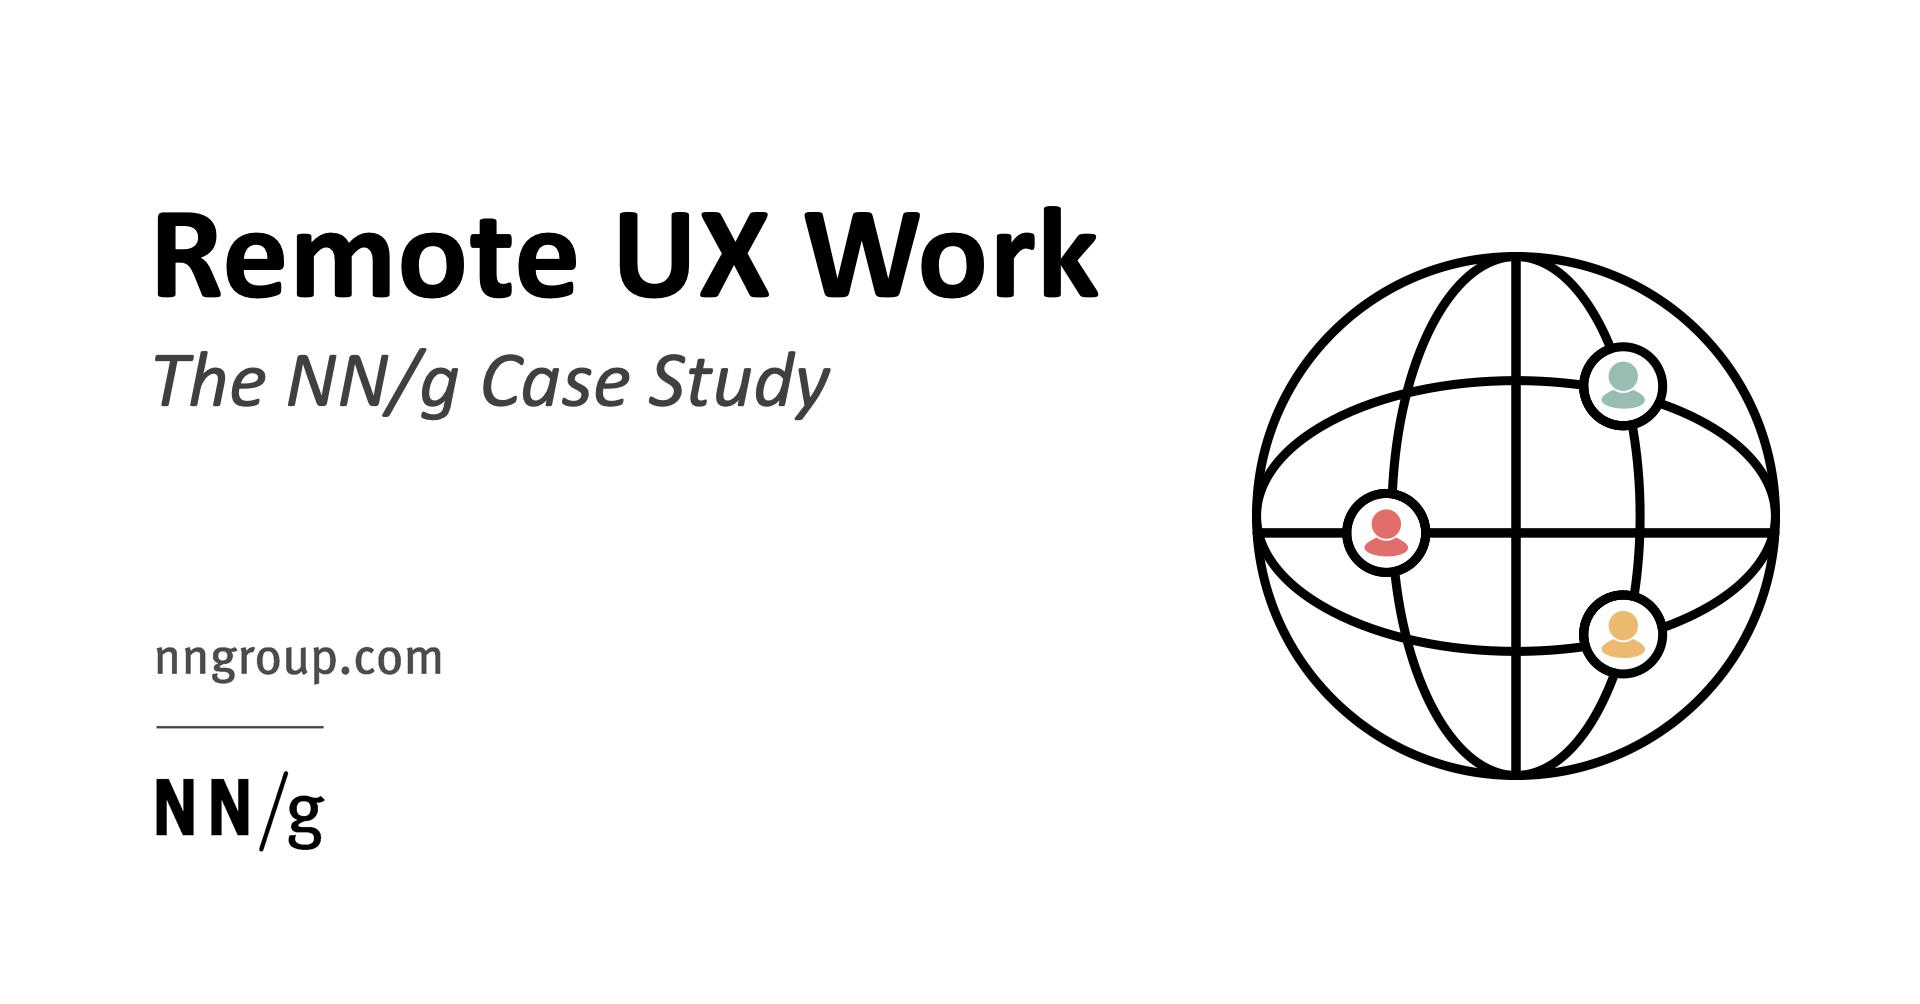 Remote UX Work: The NN/g Case Study